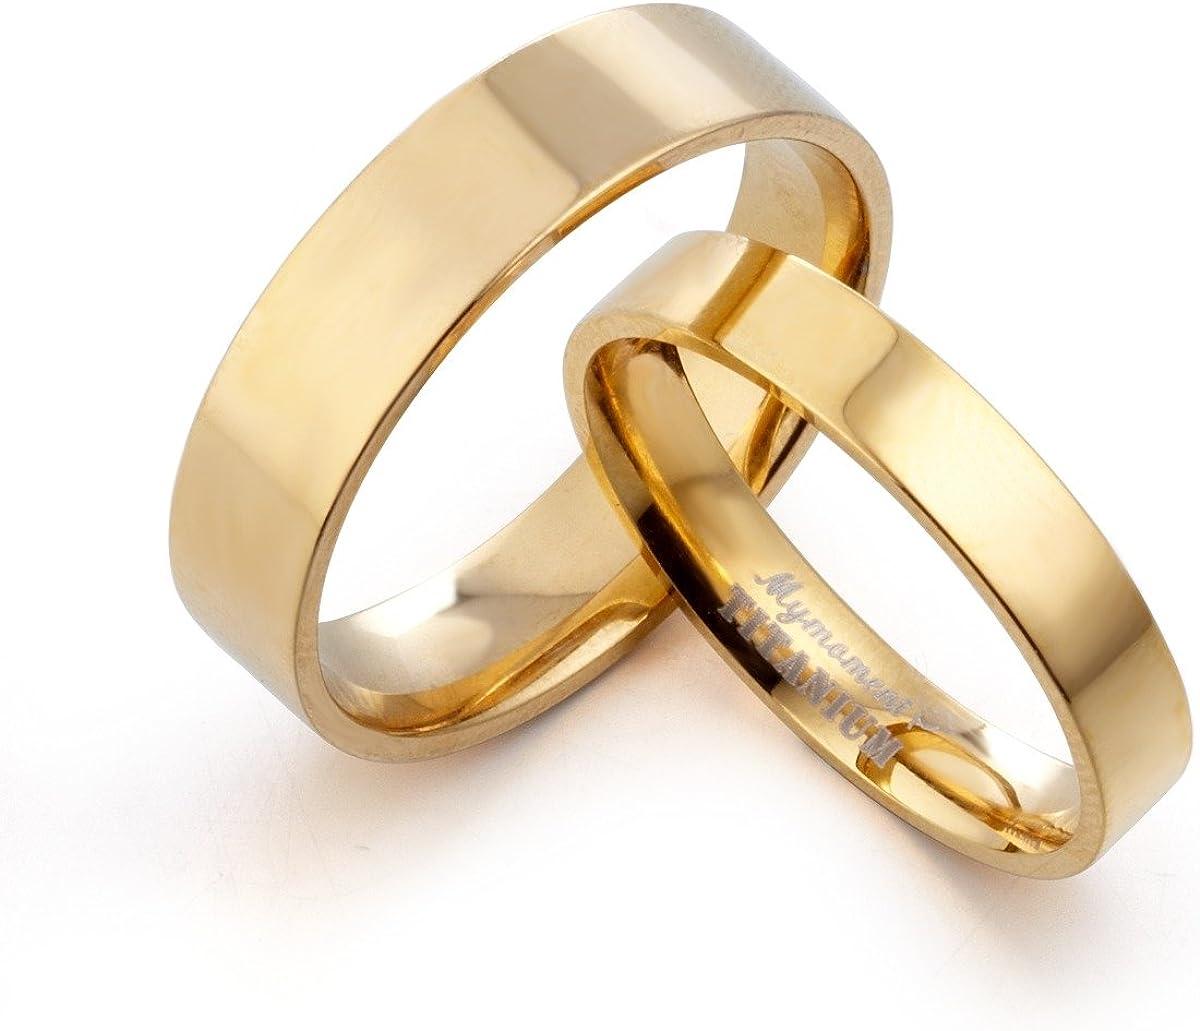 Gemini Groom & Bride Matching 18K Gold Filled Anniversary Wedding Titanium Rings Set, Width 6mm & 4mm Men Ring Size : 15 Women Ring Size : 6.5